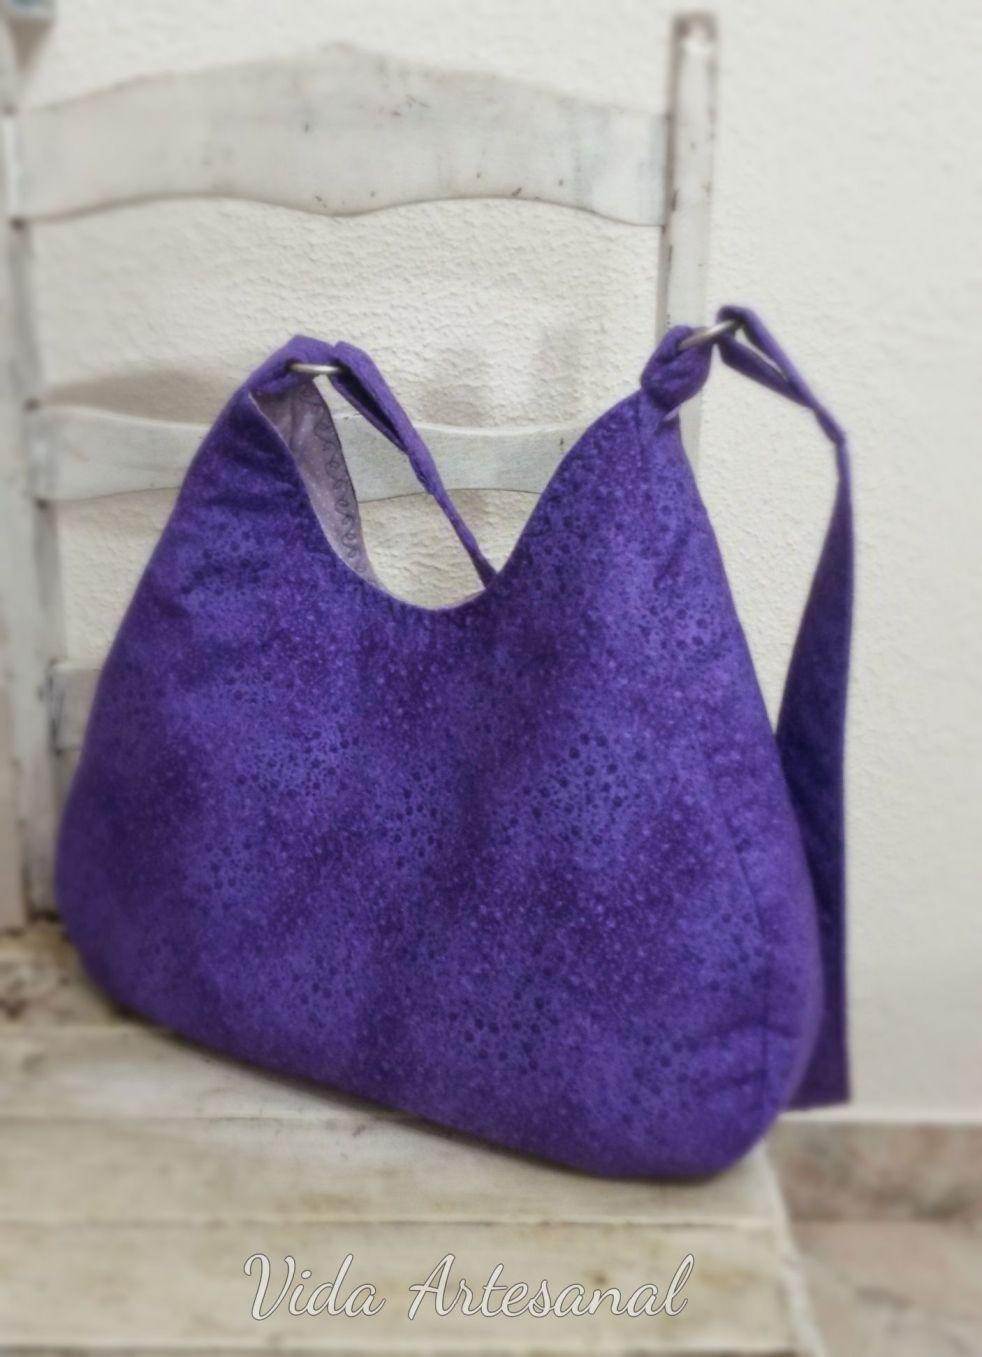 Bolsa De Tecido Artesanal : Bolsa de tecido vida artesanal